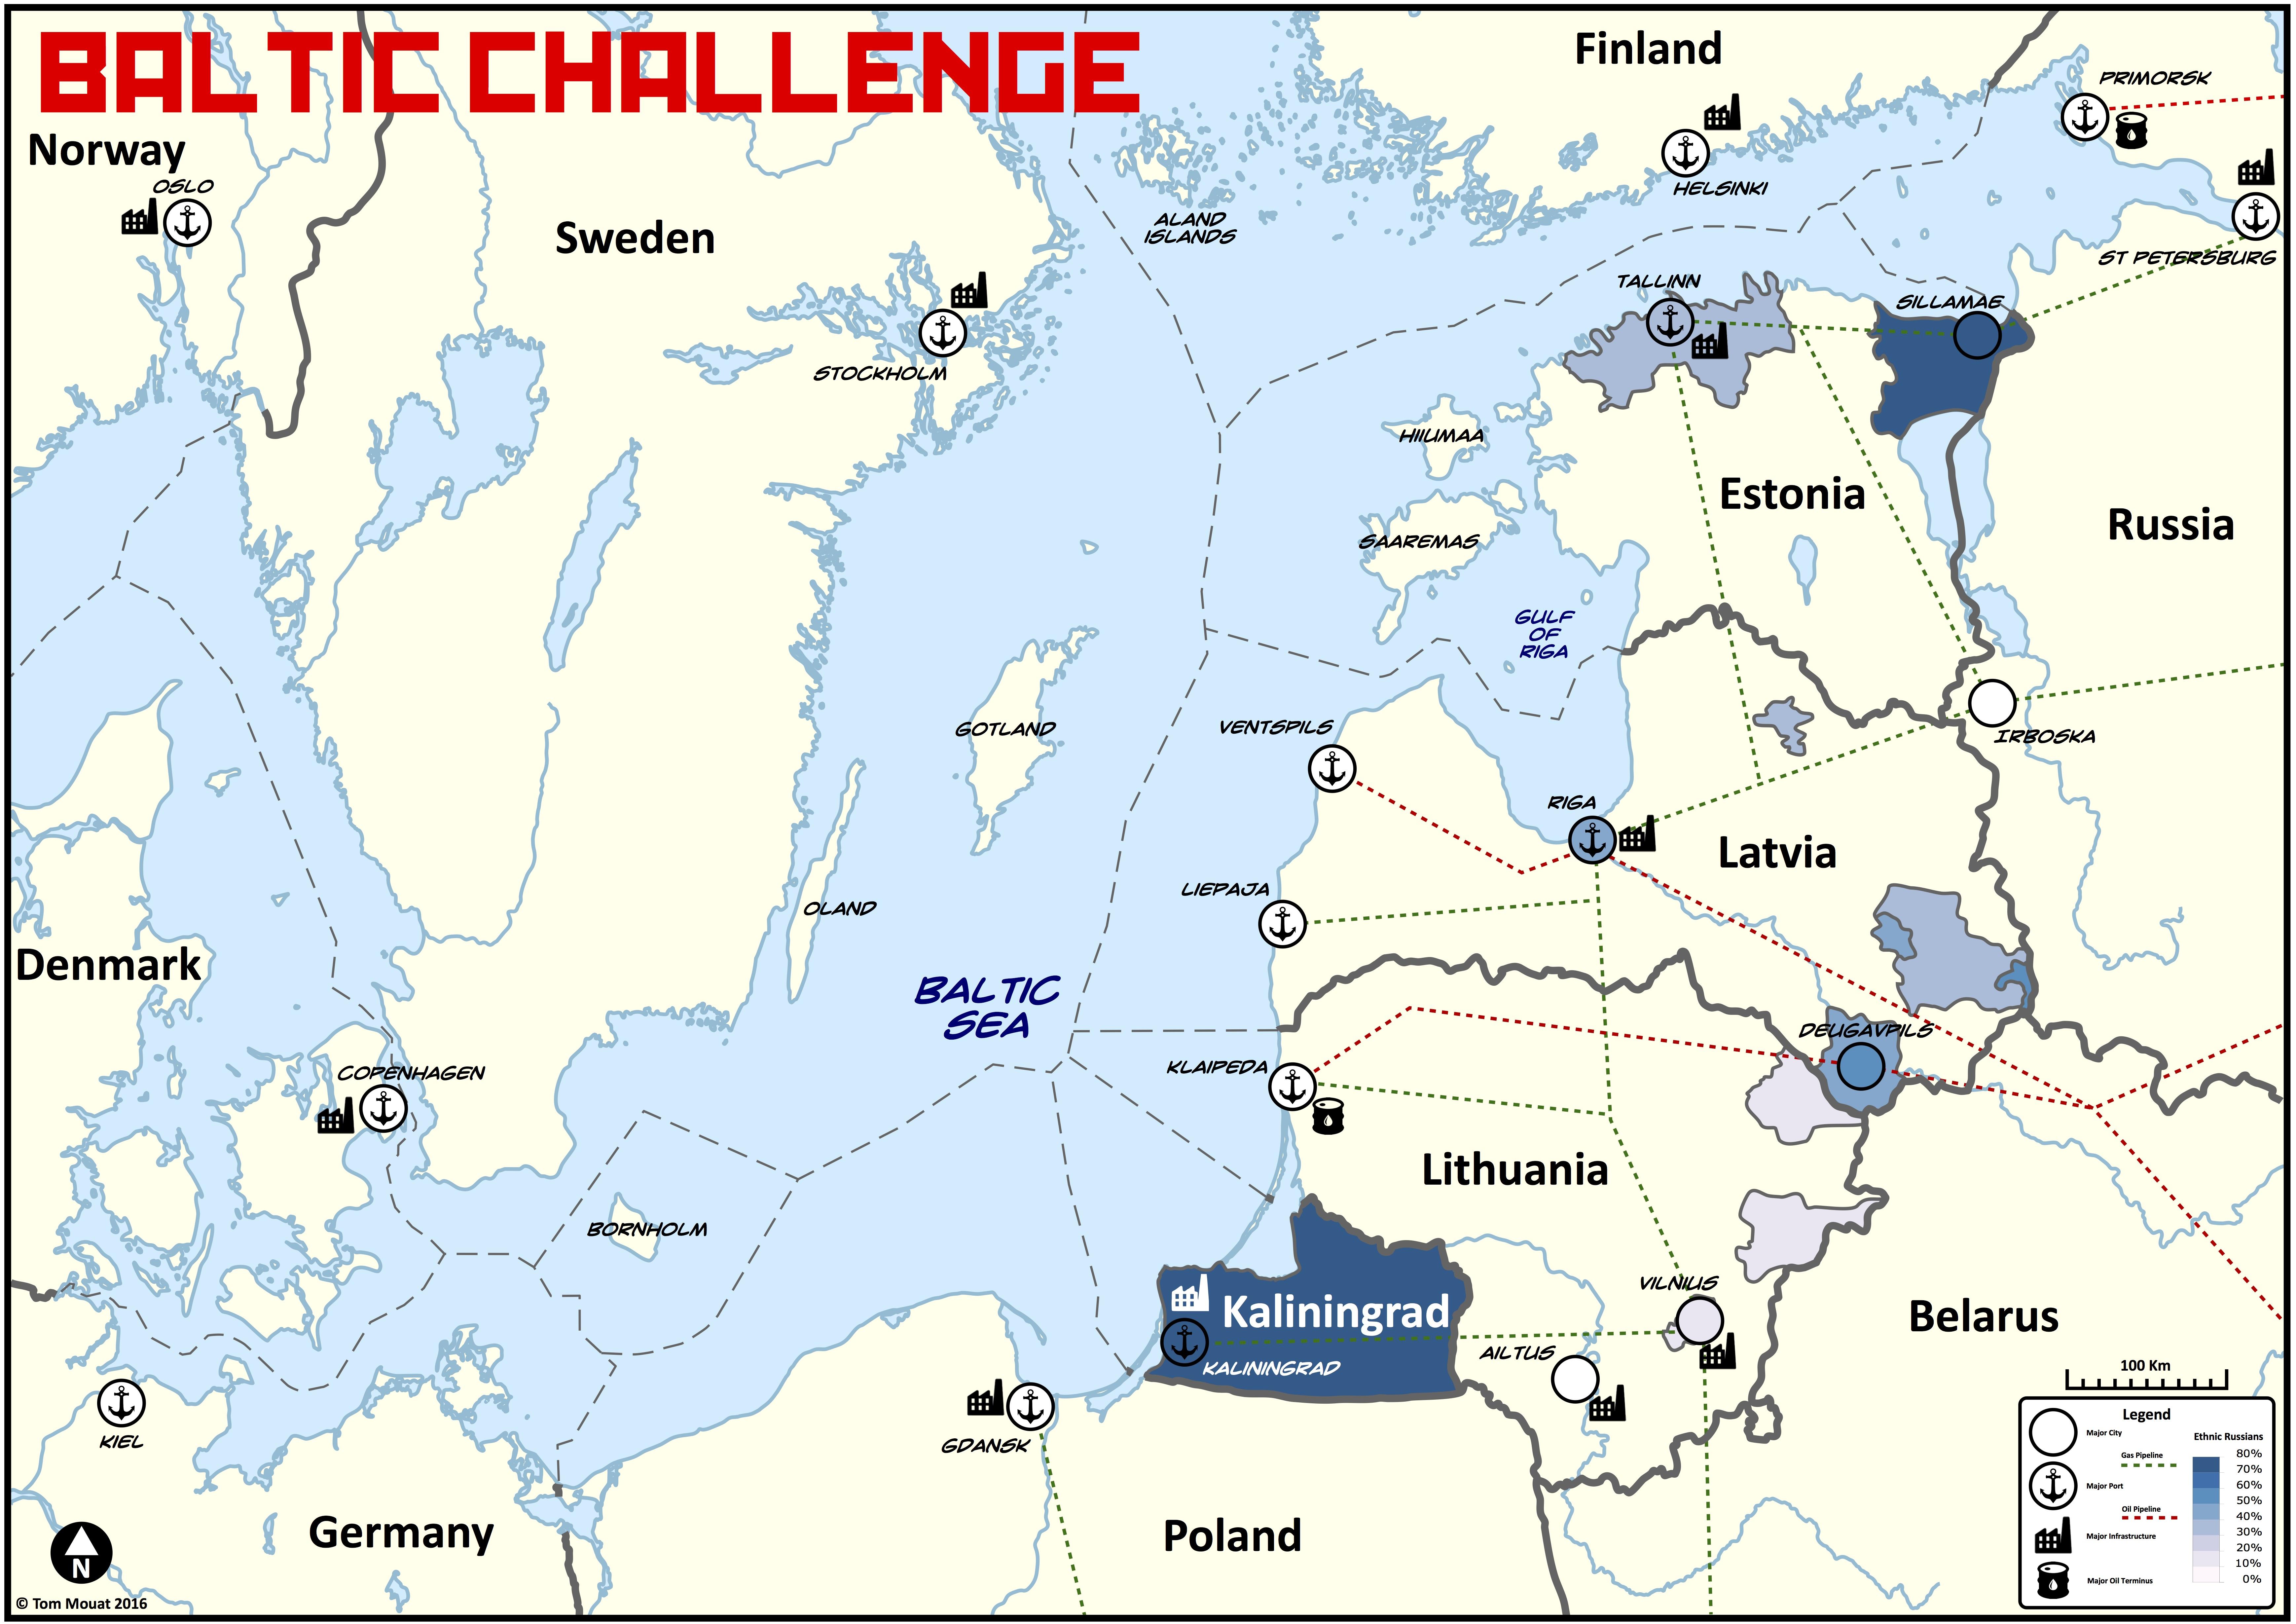 baltic-challenge-map-v2